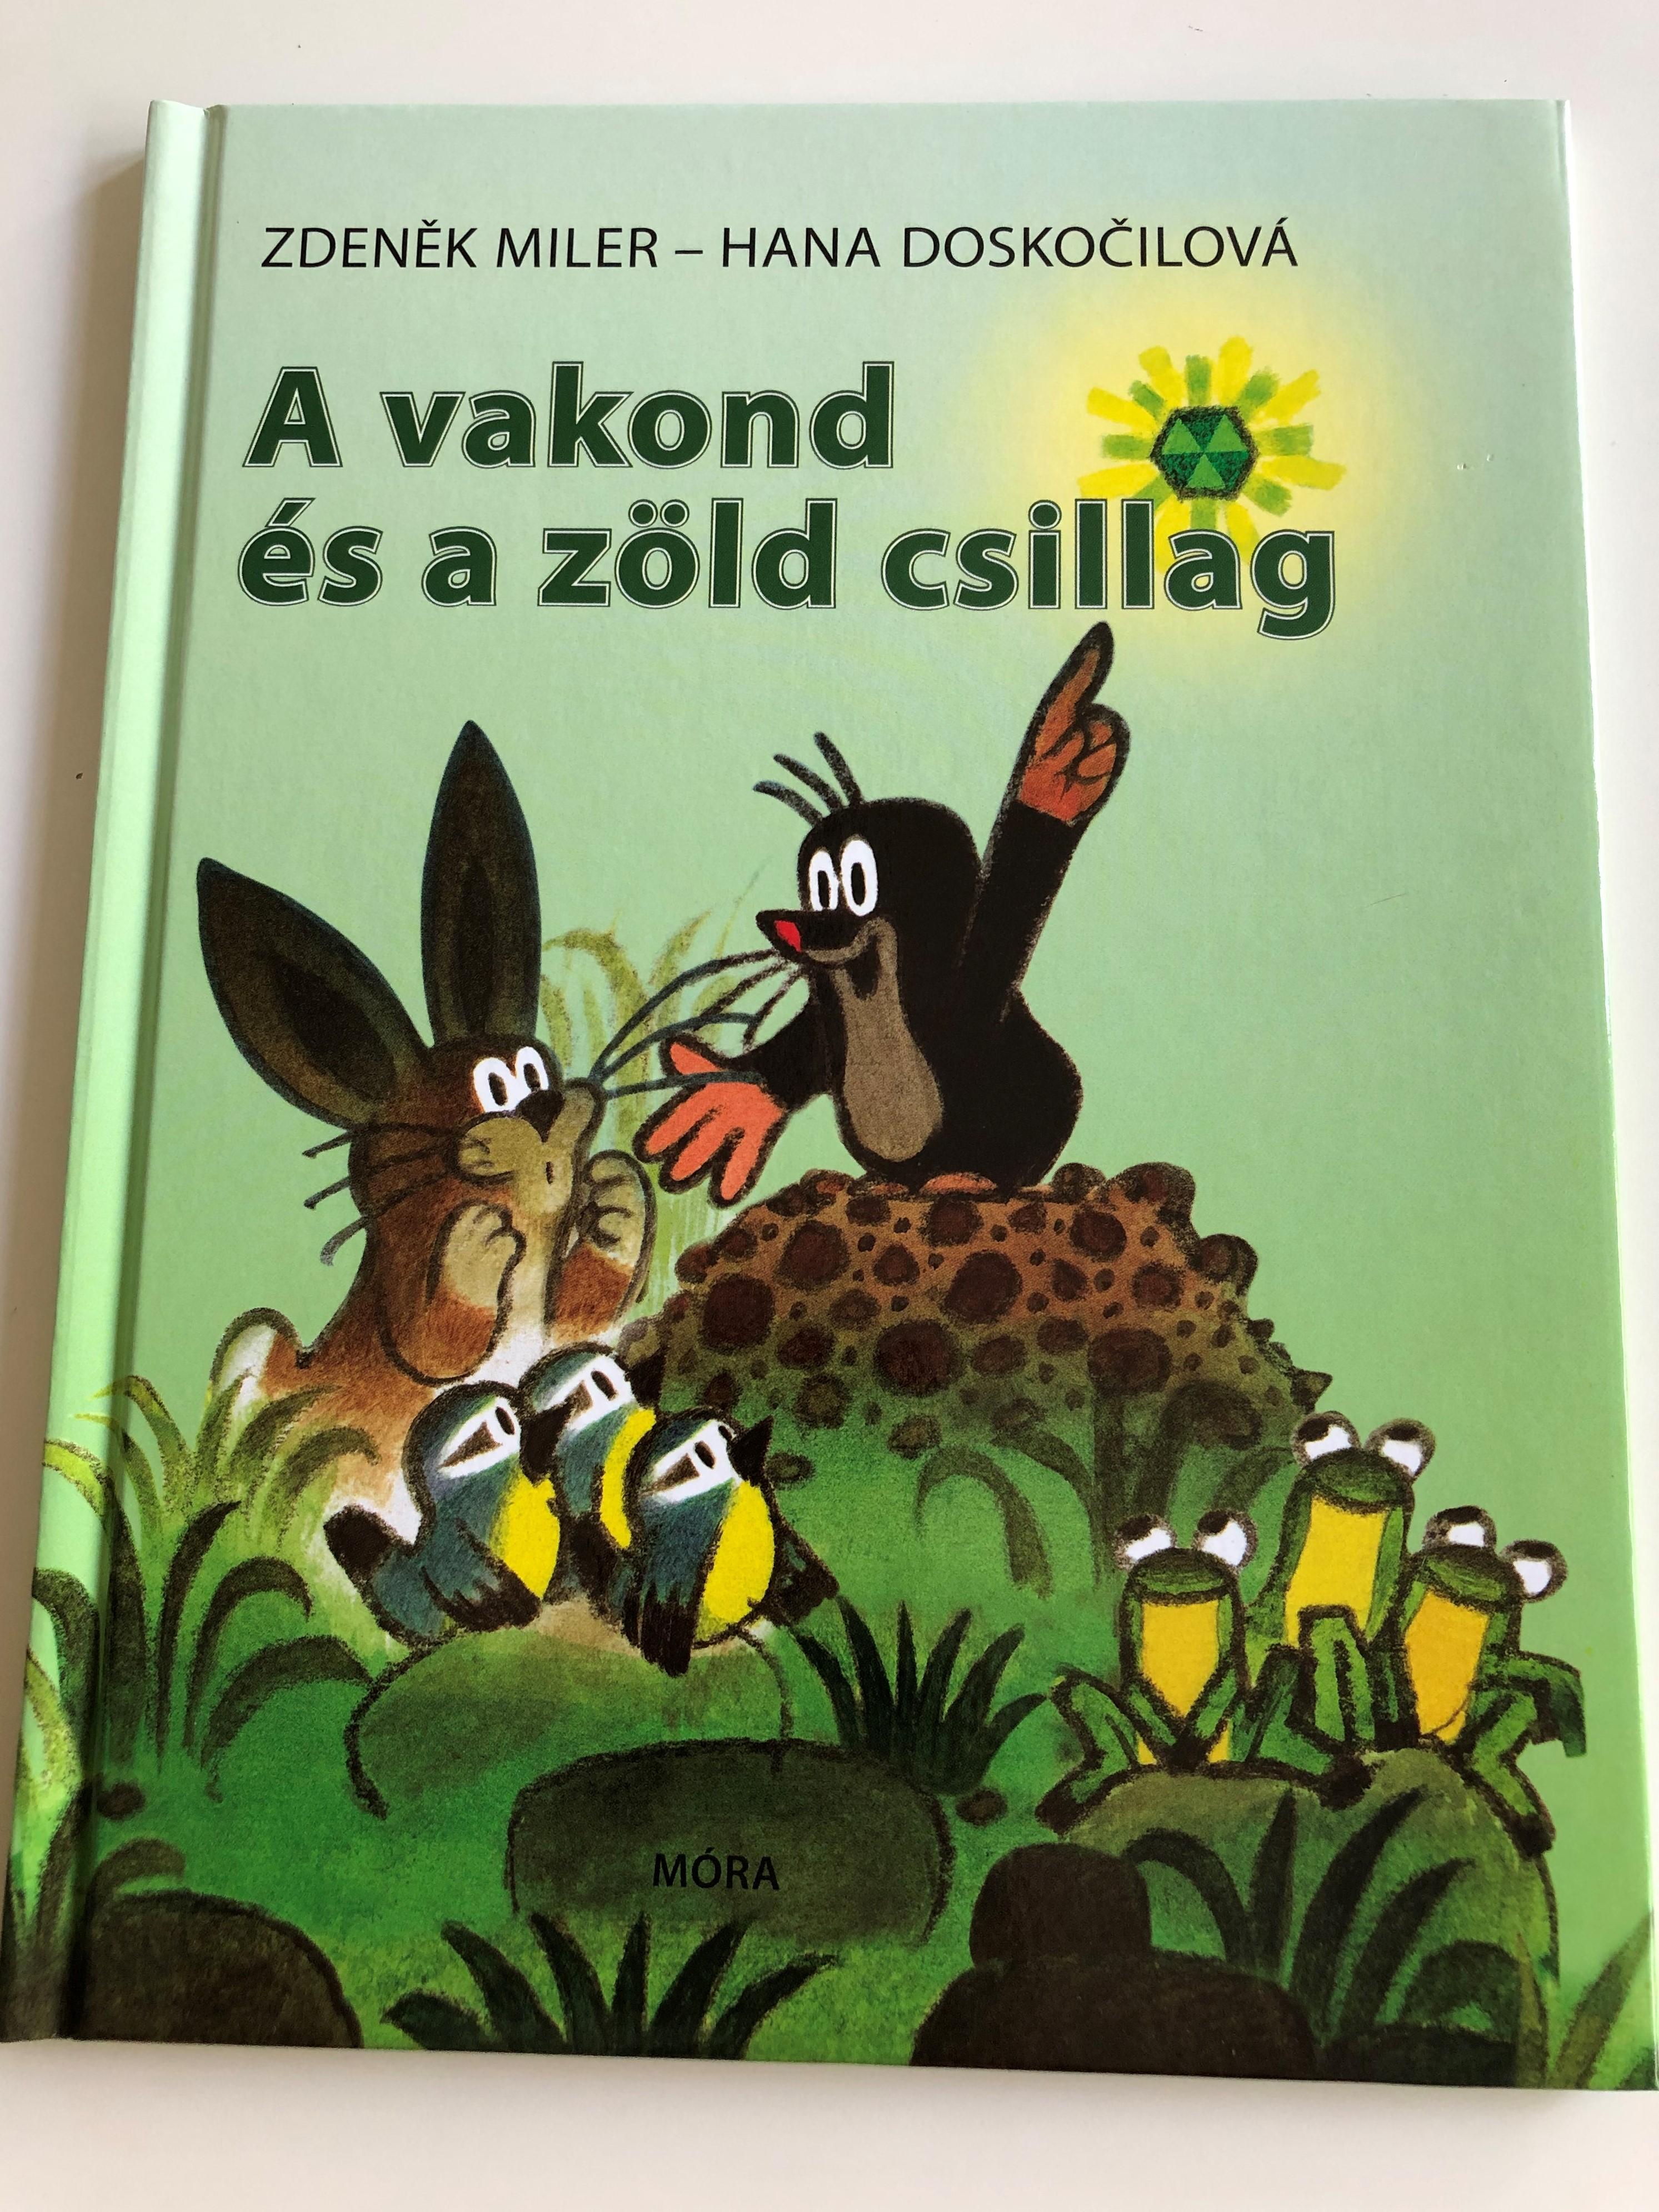 a-vakond-s-a-z-ld-csillag-by-zdenek-miler-hana-dosko-ilov-hungarian-translation-of-krtek-a-zelena-hvezda-m-ra-k-nyvkiad-2008-1-.jpg